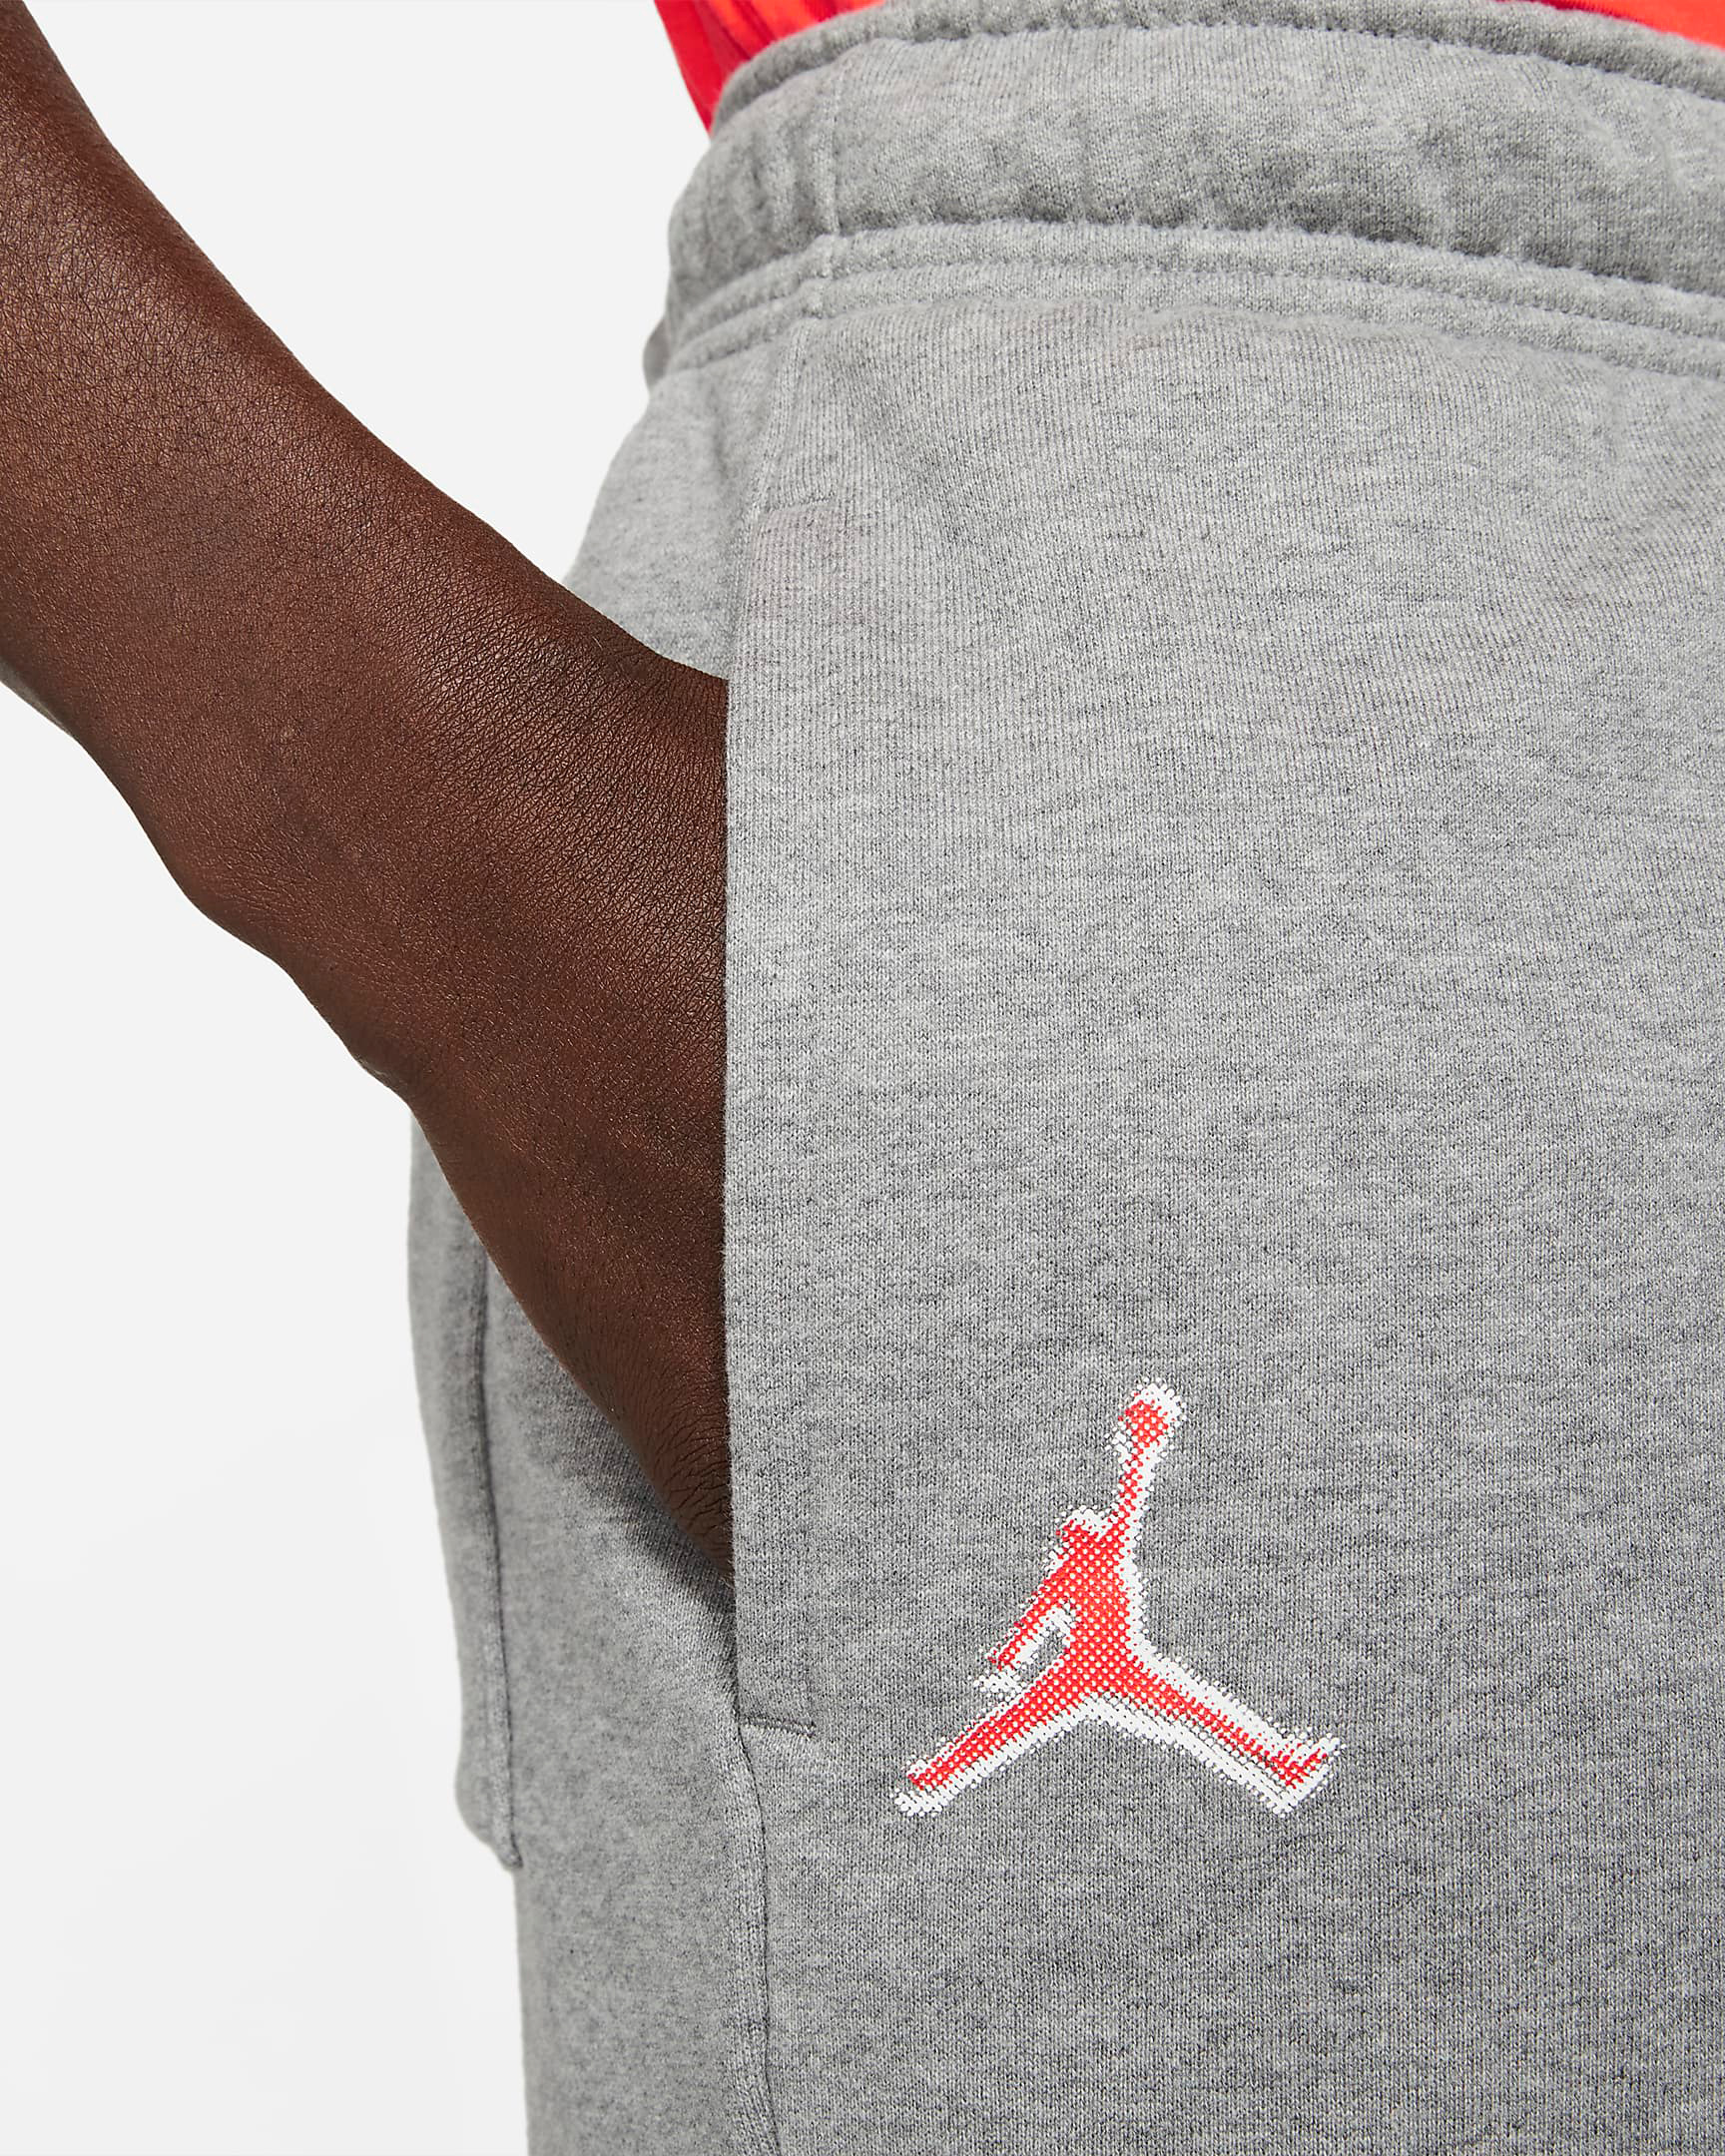 jordan-orange-grey-sport-dna-shorts-4